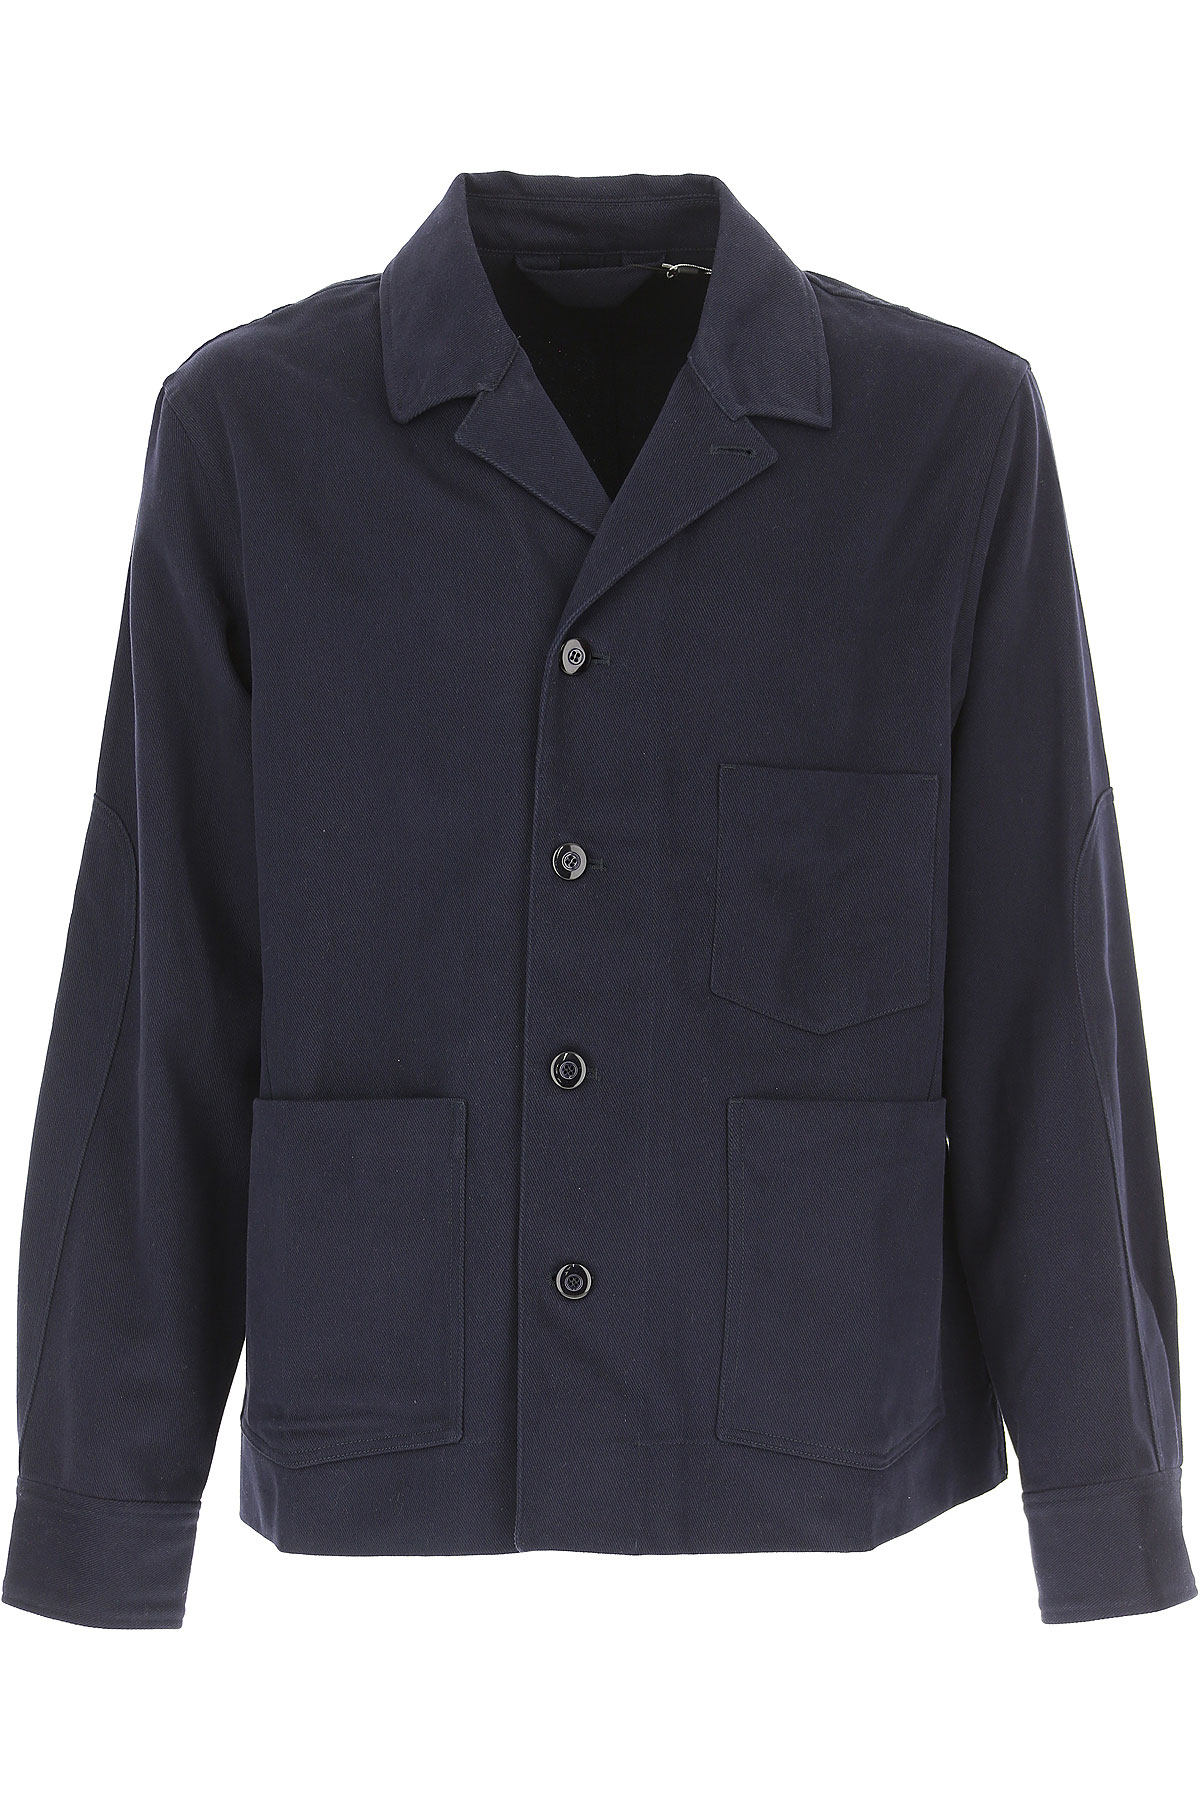 Image of Acne Studios Blazer for Men, Sport Coat, Blue Ink, Cotton, 2017, L M